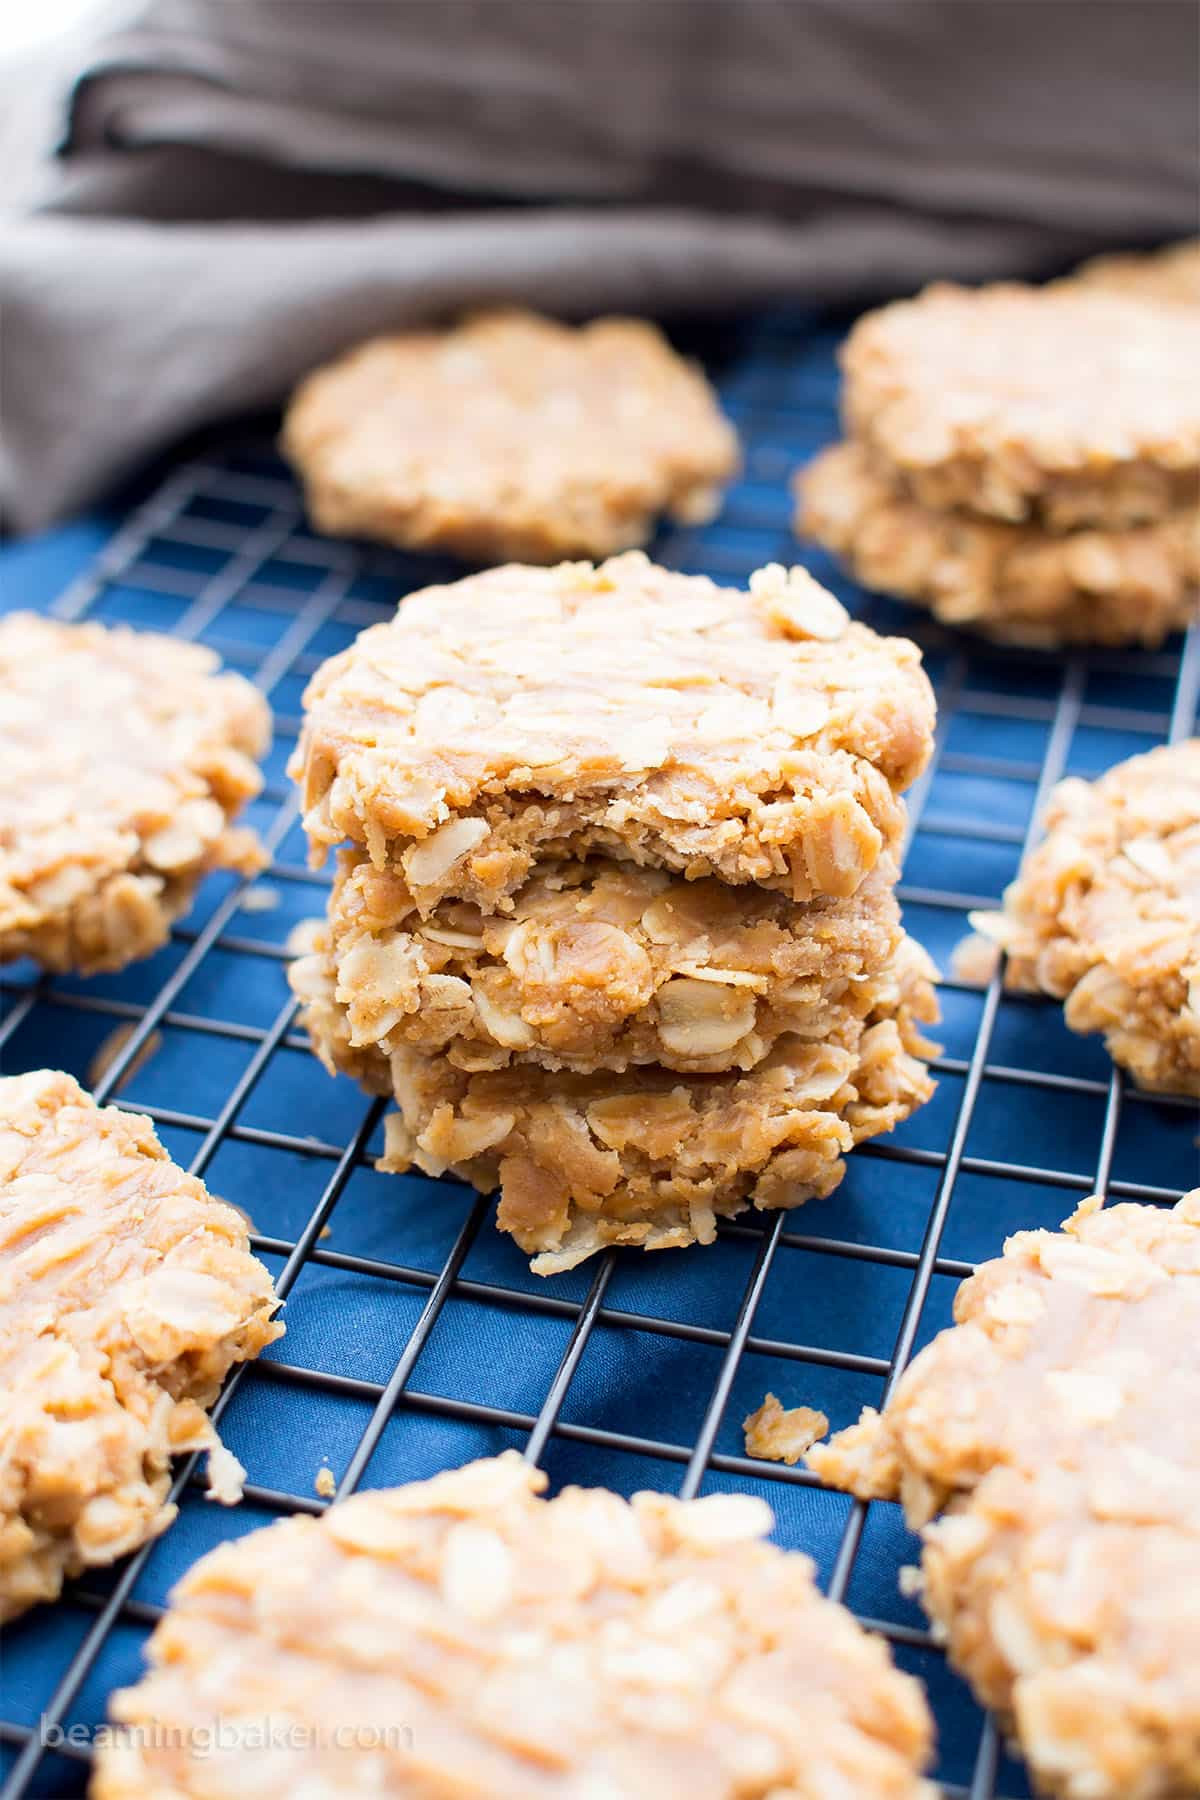 No Bake Vegan Oatmeal Cookies  3 Ingre nt No Bake Peanut Butter Oatmeal Cookies Gluten